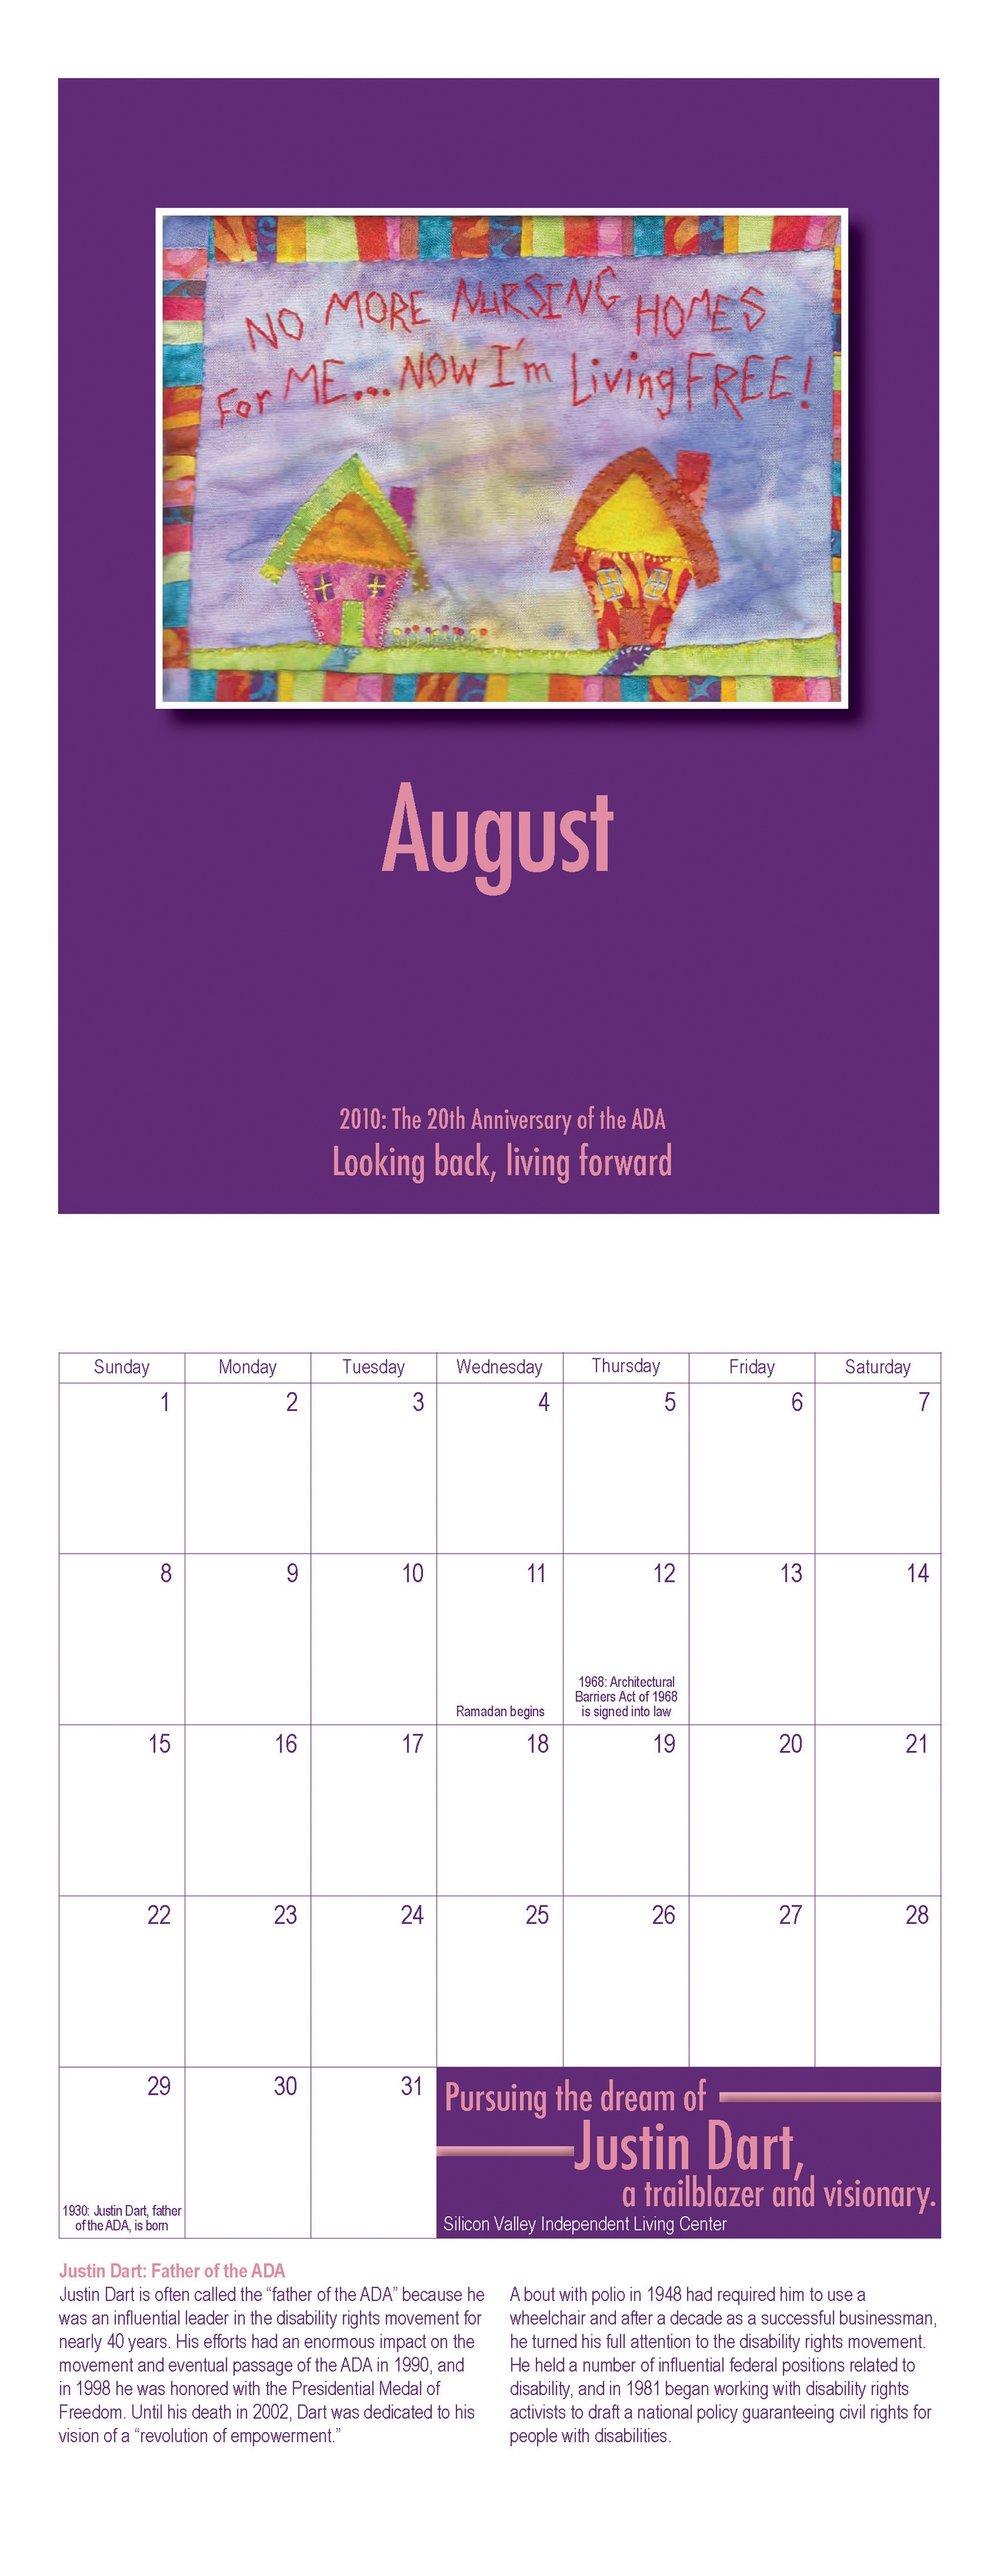 SVILC 2010 Calendar  August spread